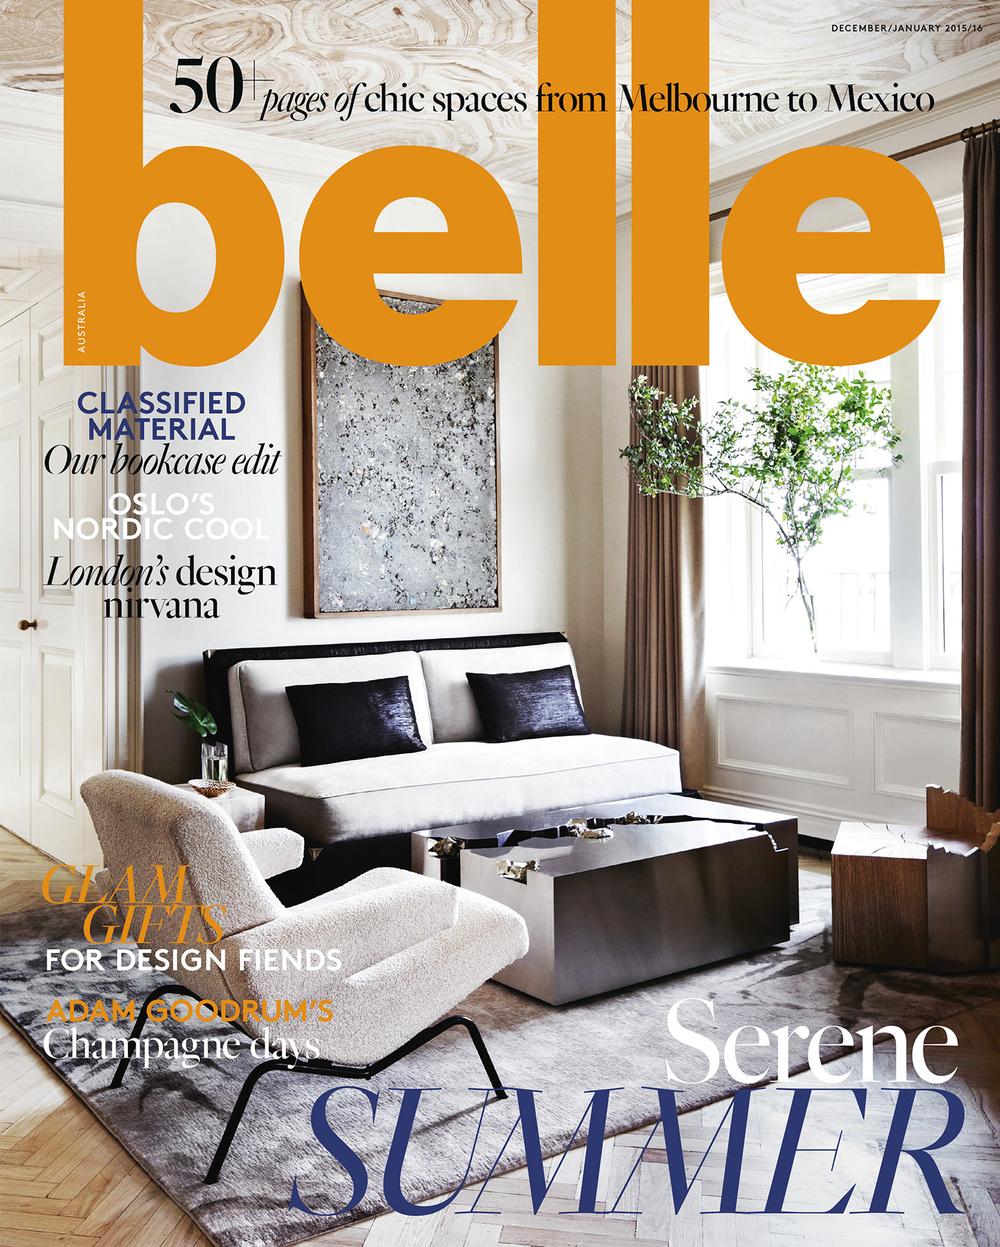 Belle Dec_Jan 2016 Cover.jpg